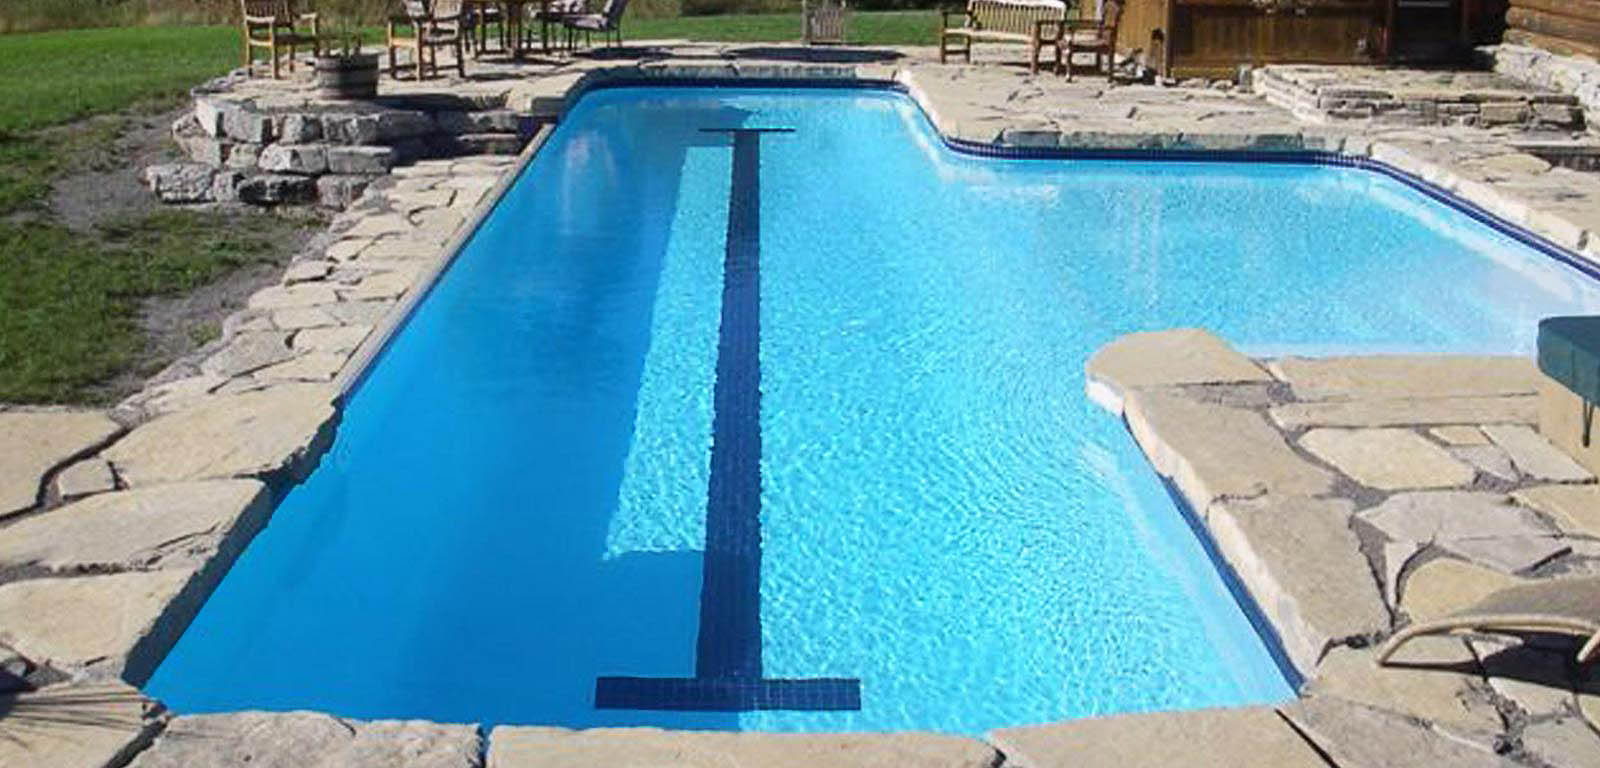 Piscine sport per allenarti in piscina a casa piscine - Piscine per casa ...